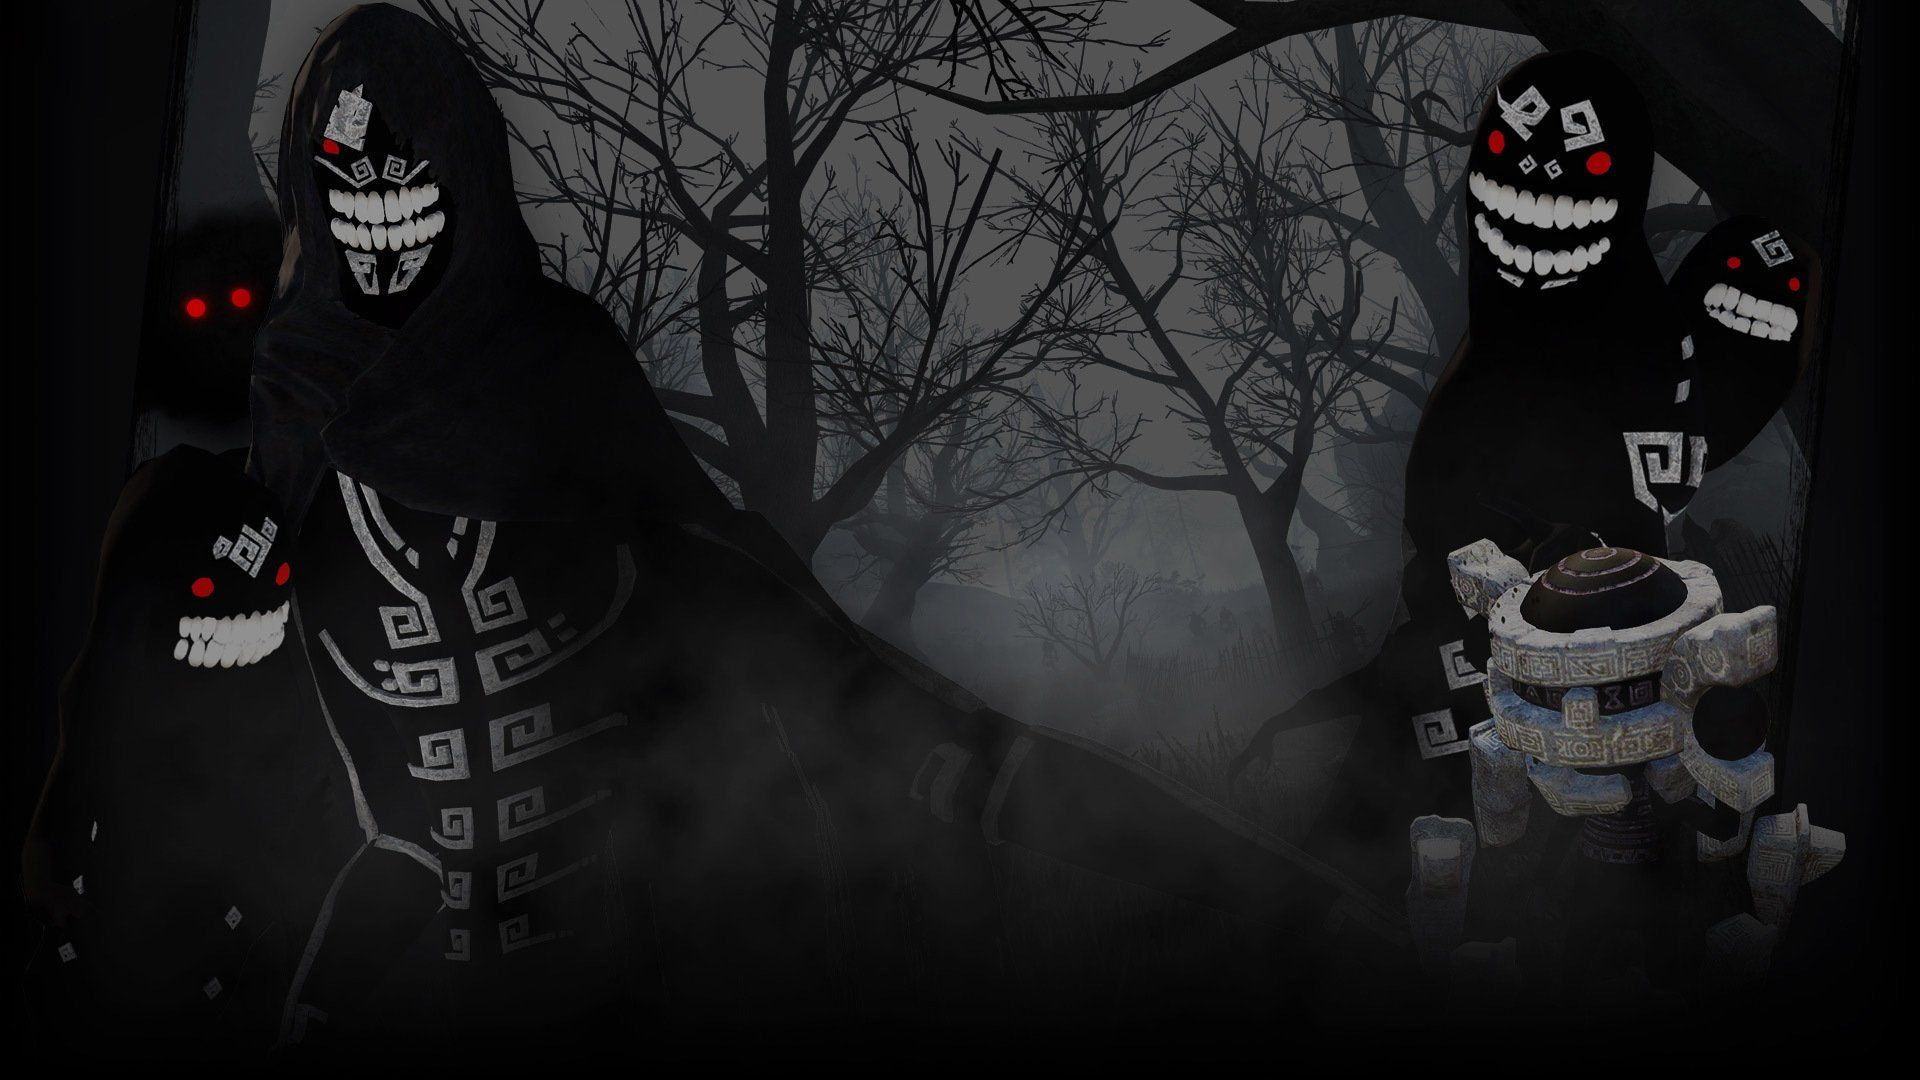 Video Game Black Desert Online Black Spirit Black Desert Online Wallpaper Wallpaper Images Hd Wallpaper Backgrounds Game Black